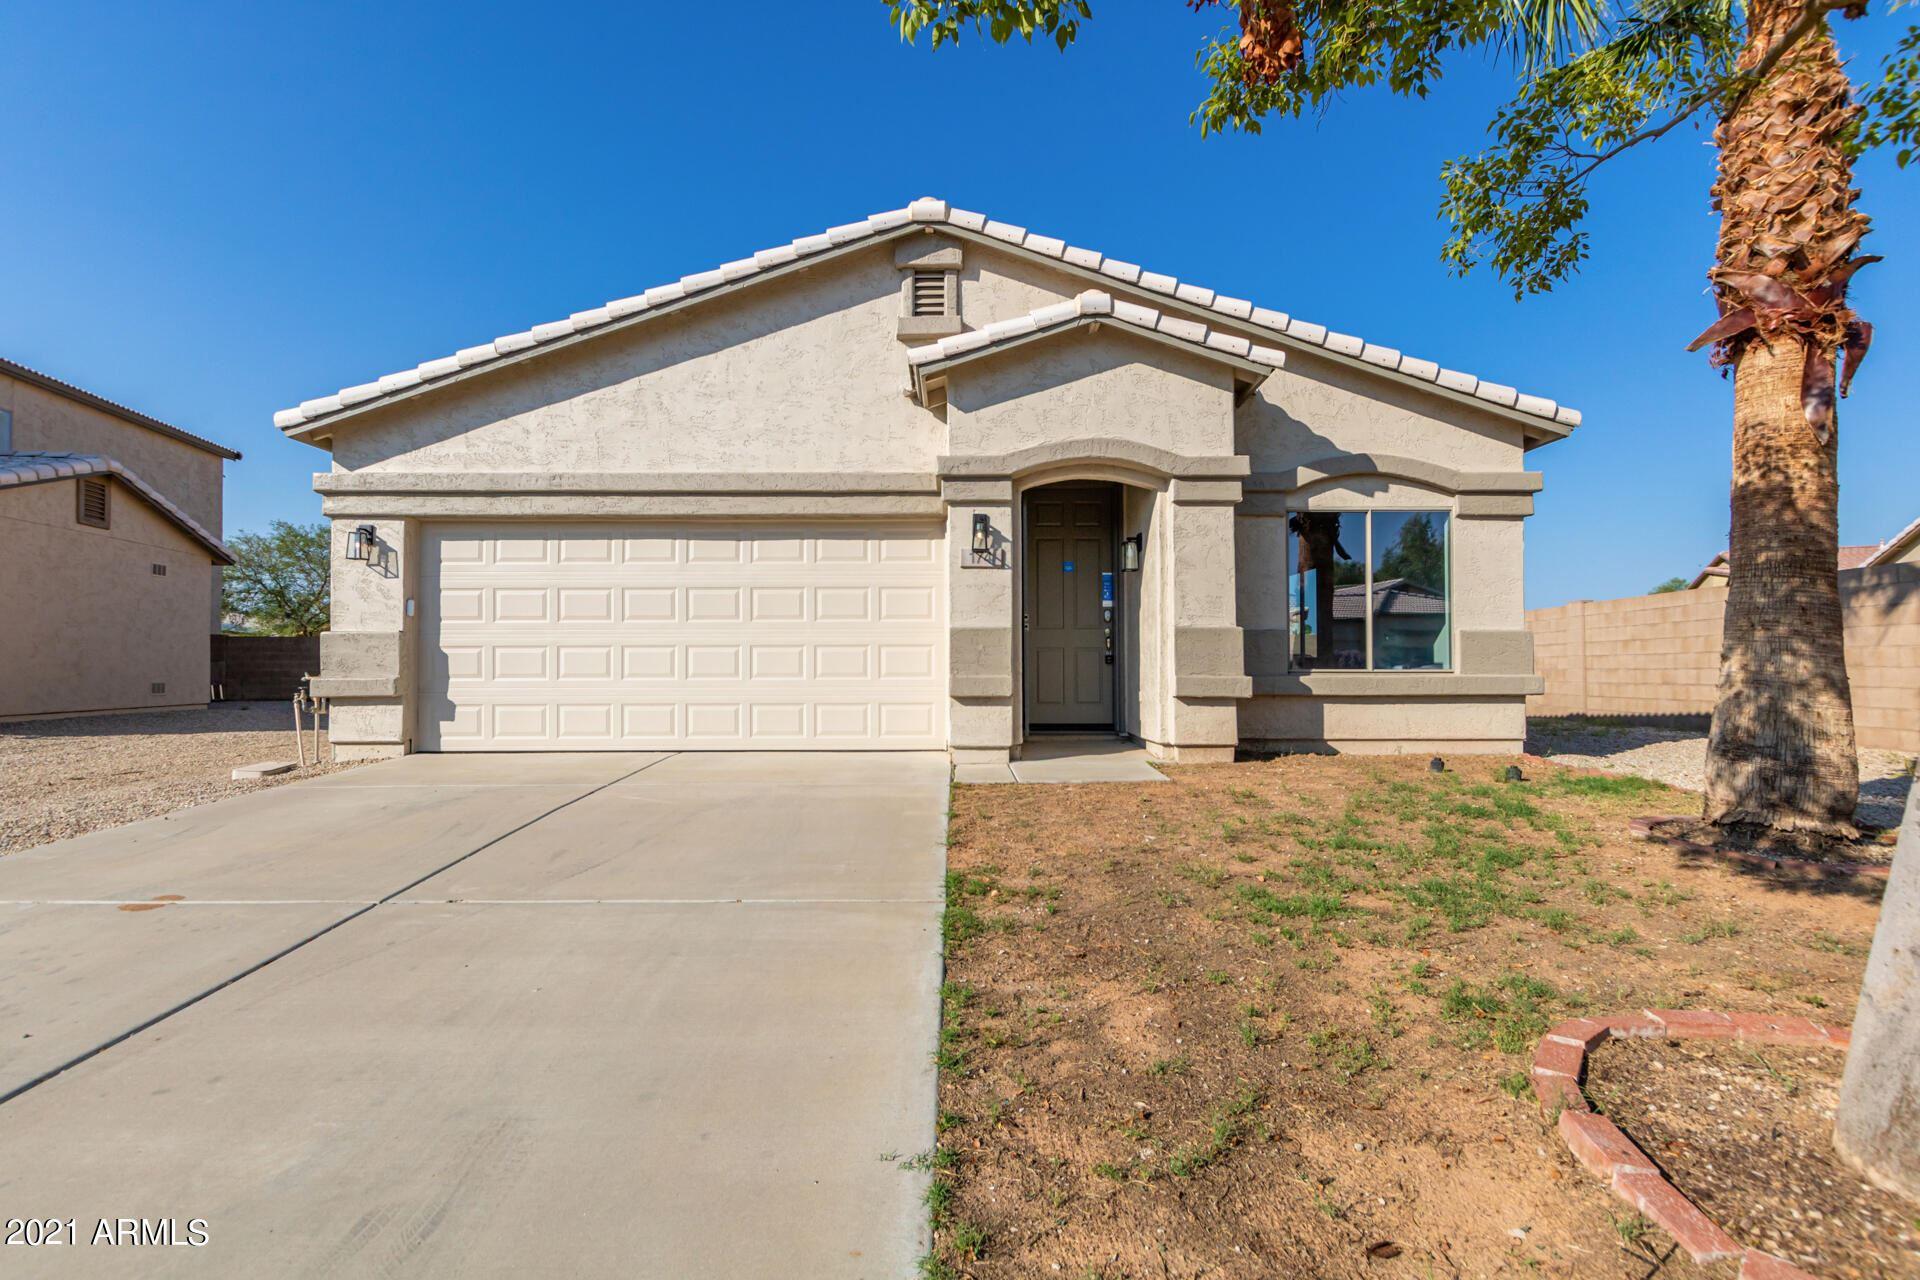 174 E PALOMINO Way, San Tan Valley, AZ 85143 - MLS#: 6274751